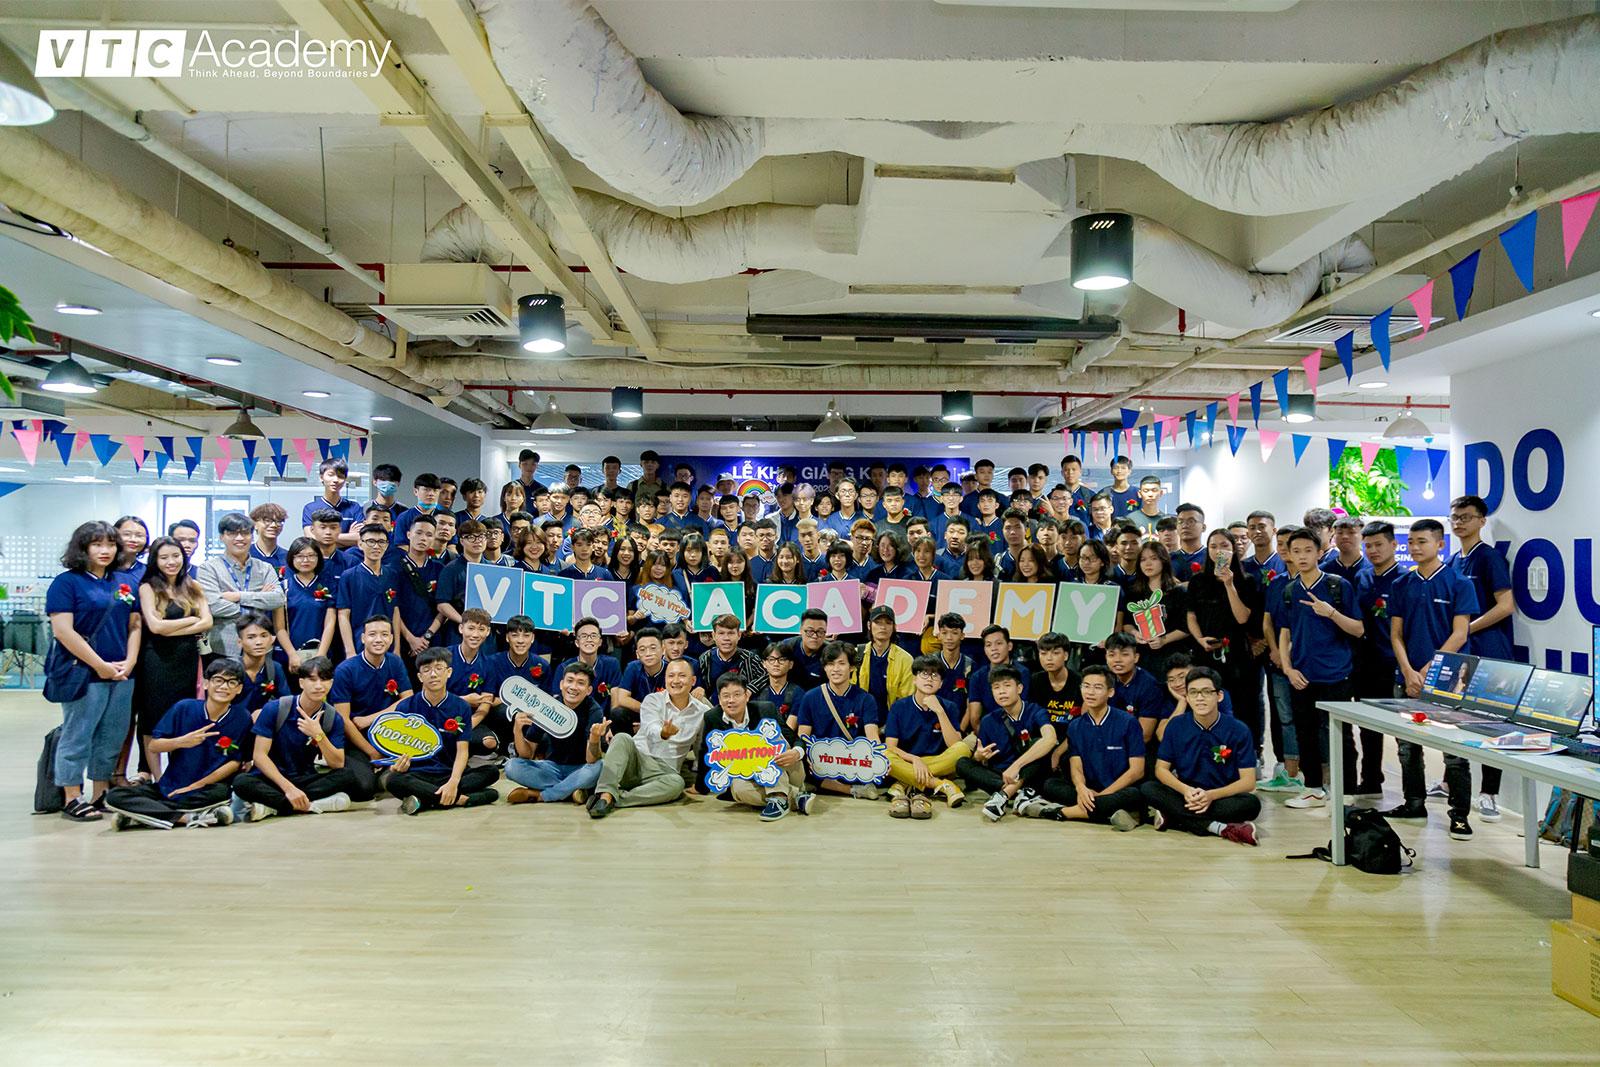 ngay-nhap-hoc-vtc-academy-1